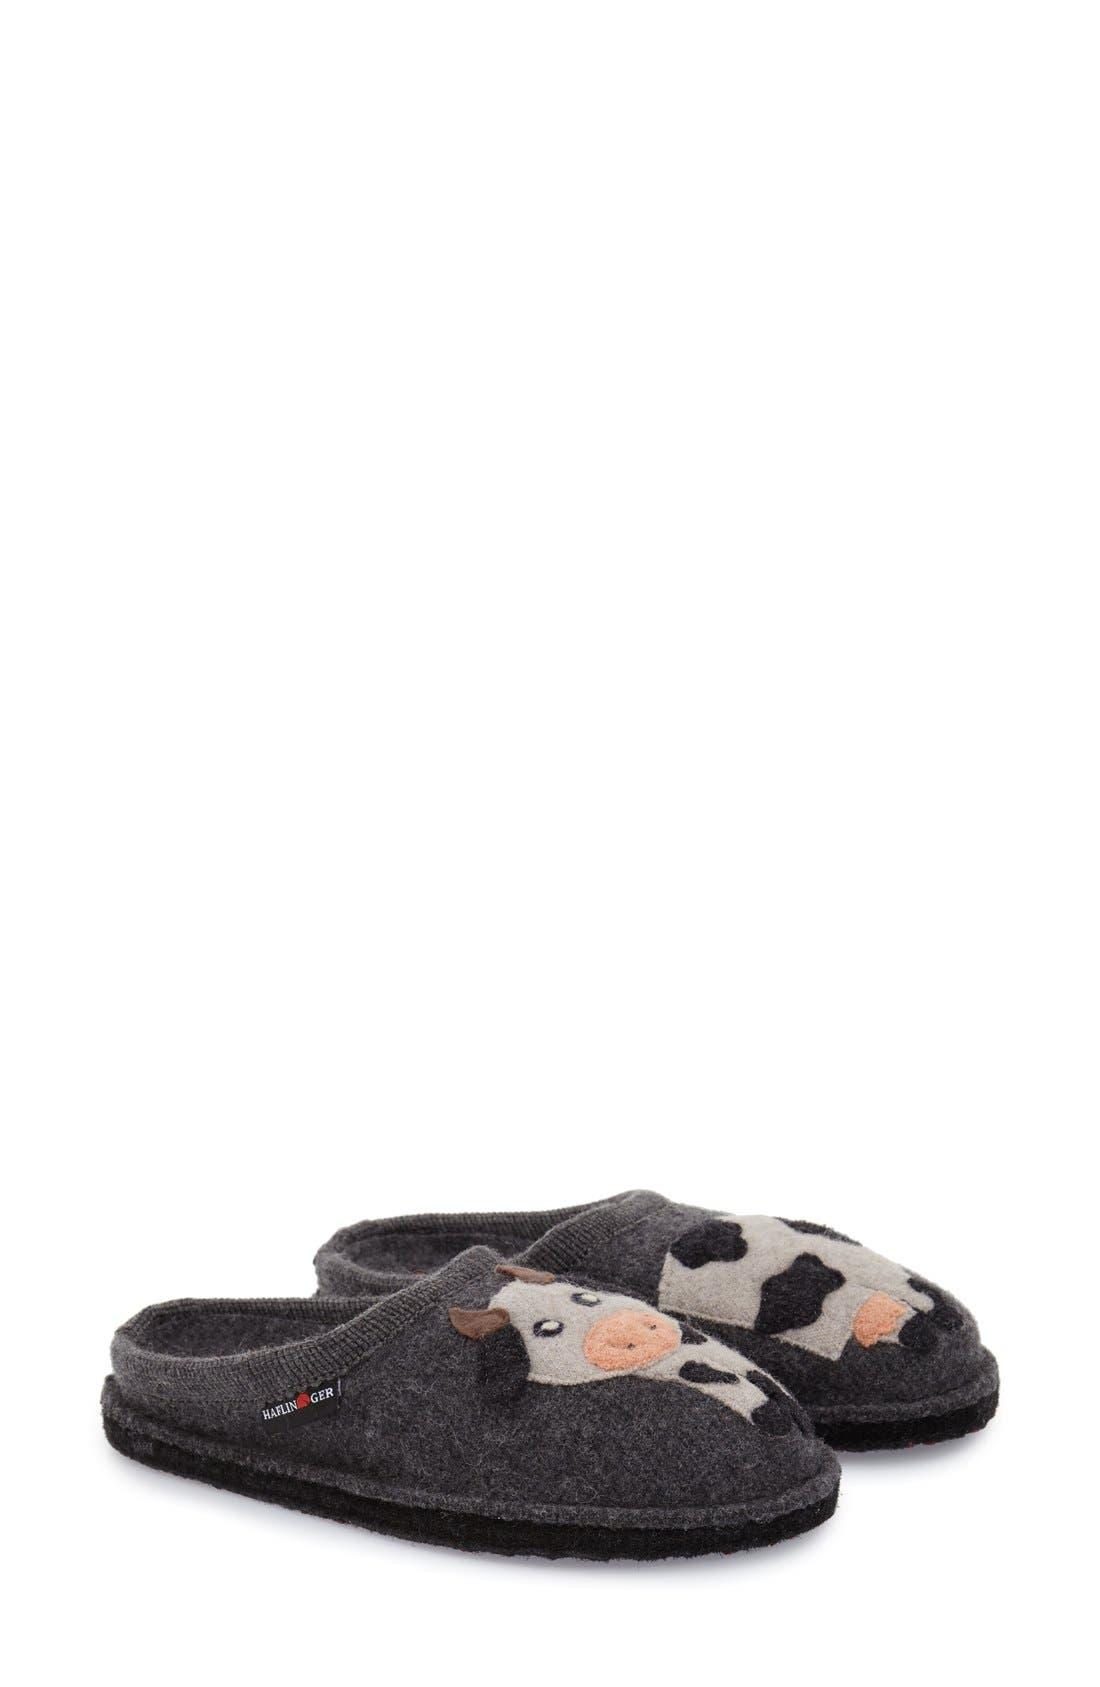 'Cow' Slipper,                             Main thumbnail 1, color,                             Grey Wool